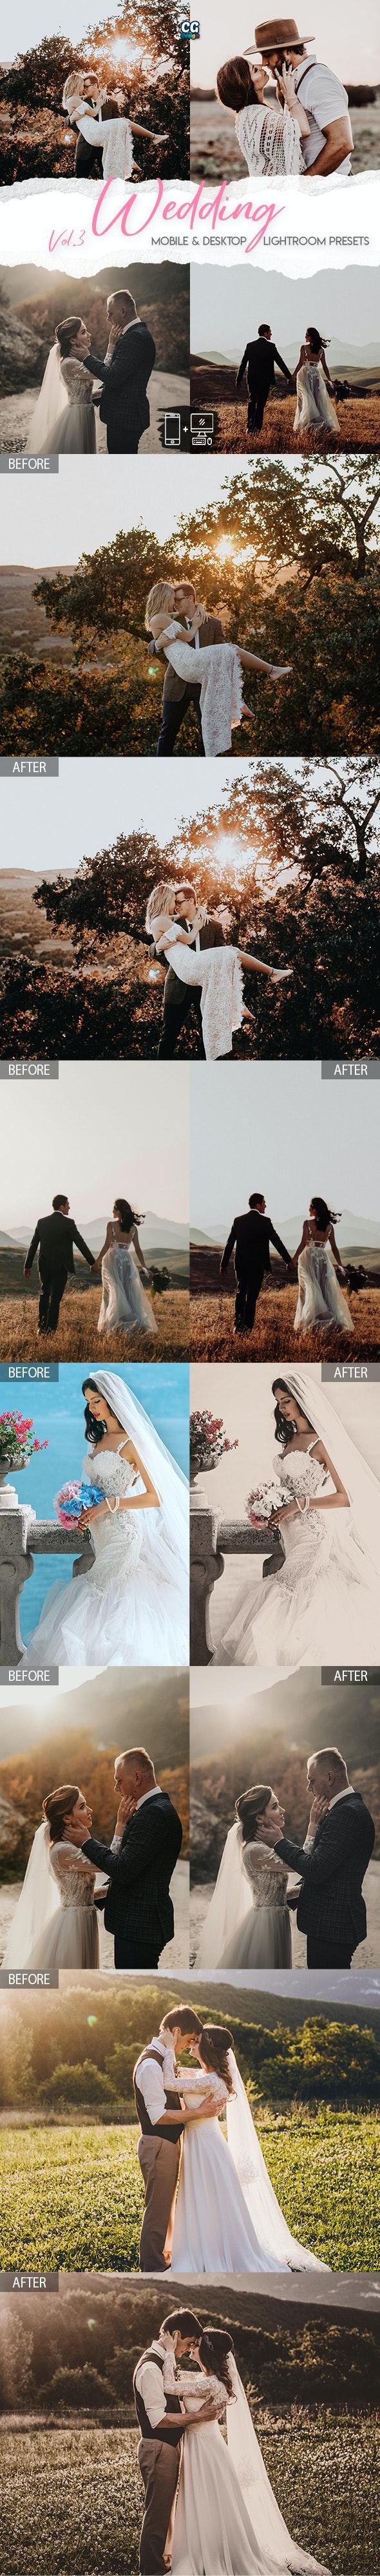 Wedding Lightroom Presets Vol. 3 - Wedding Lightroom Presets